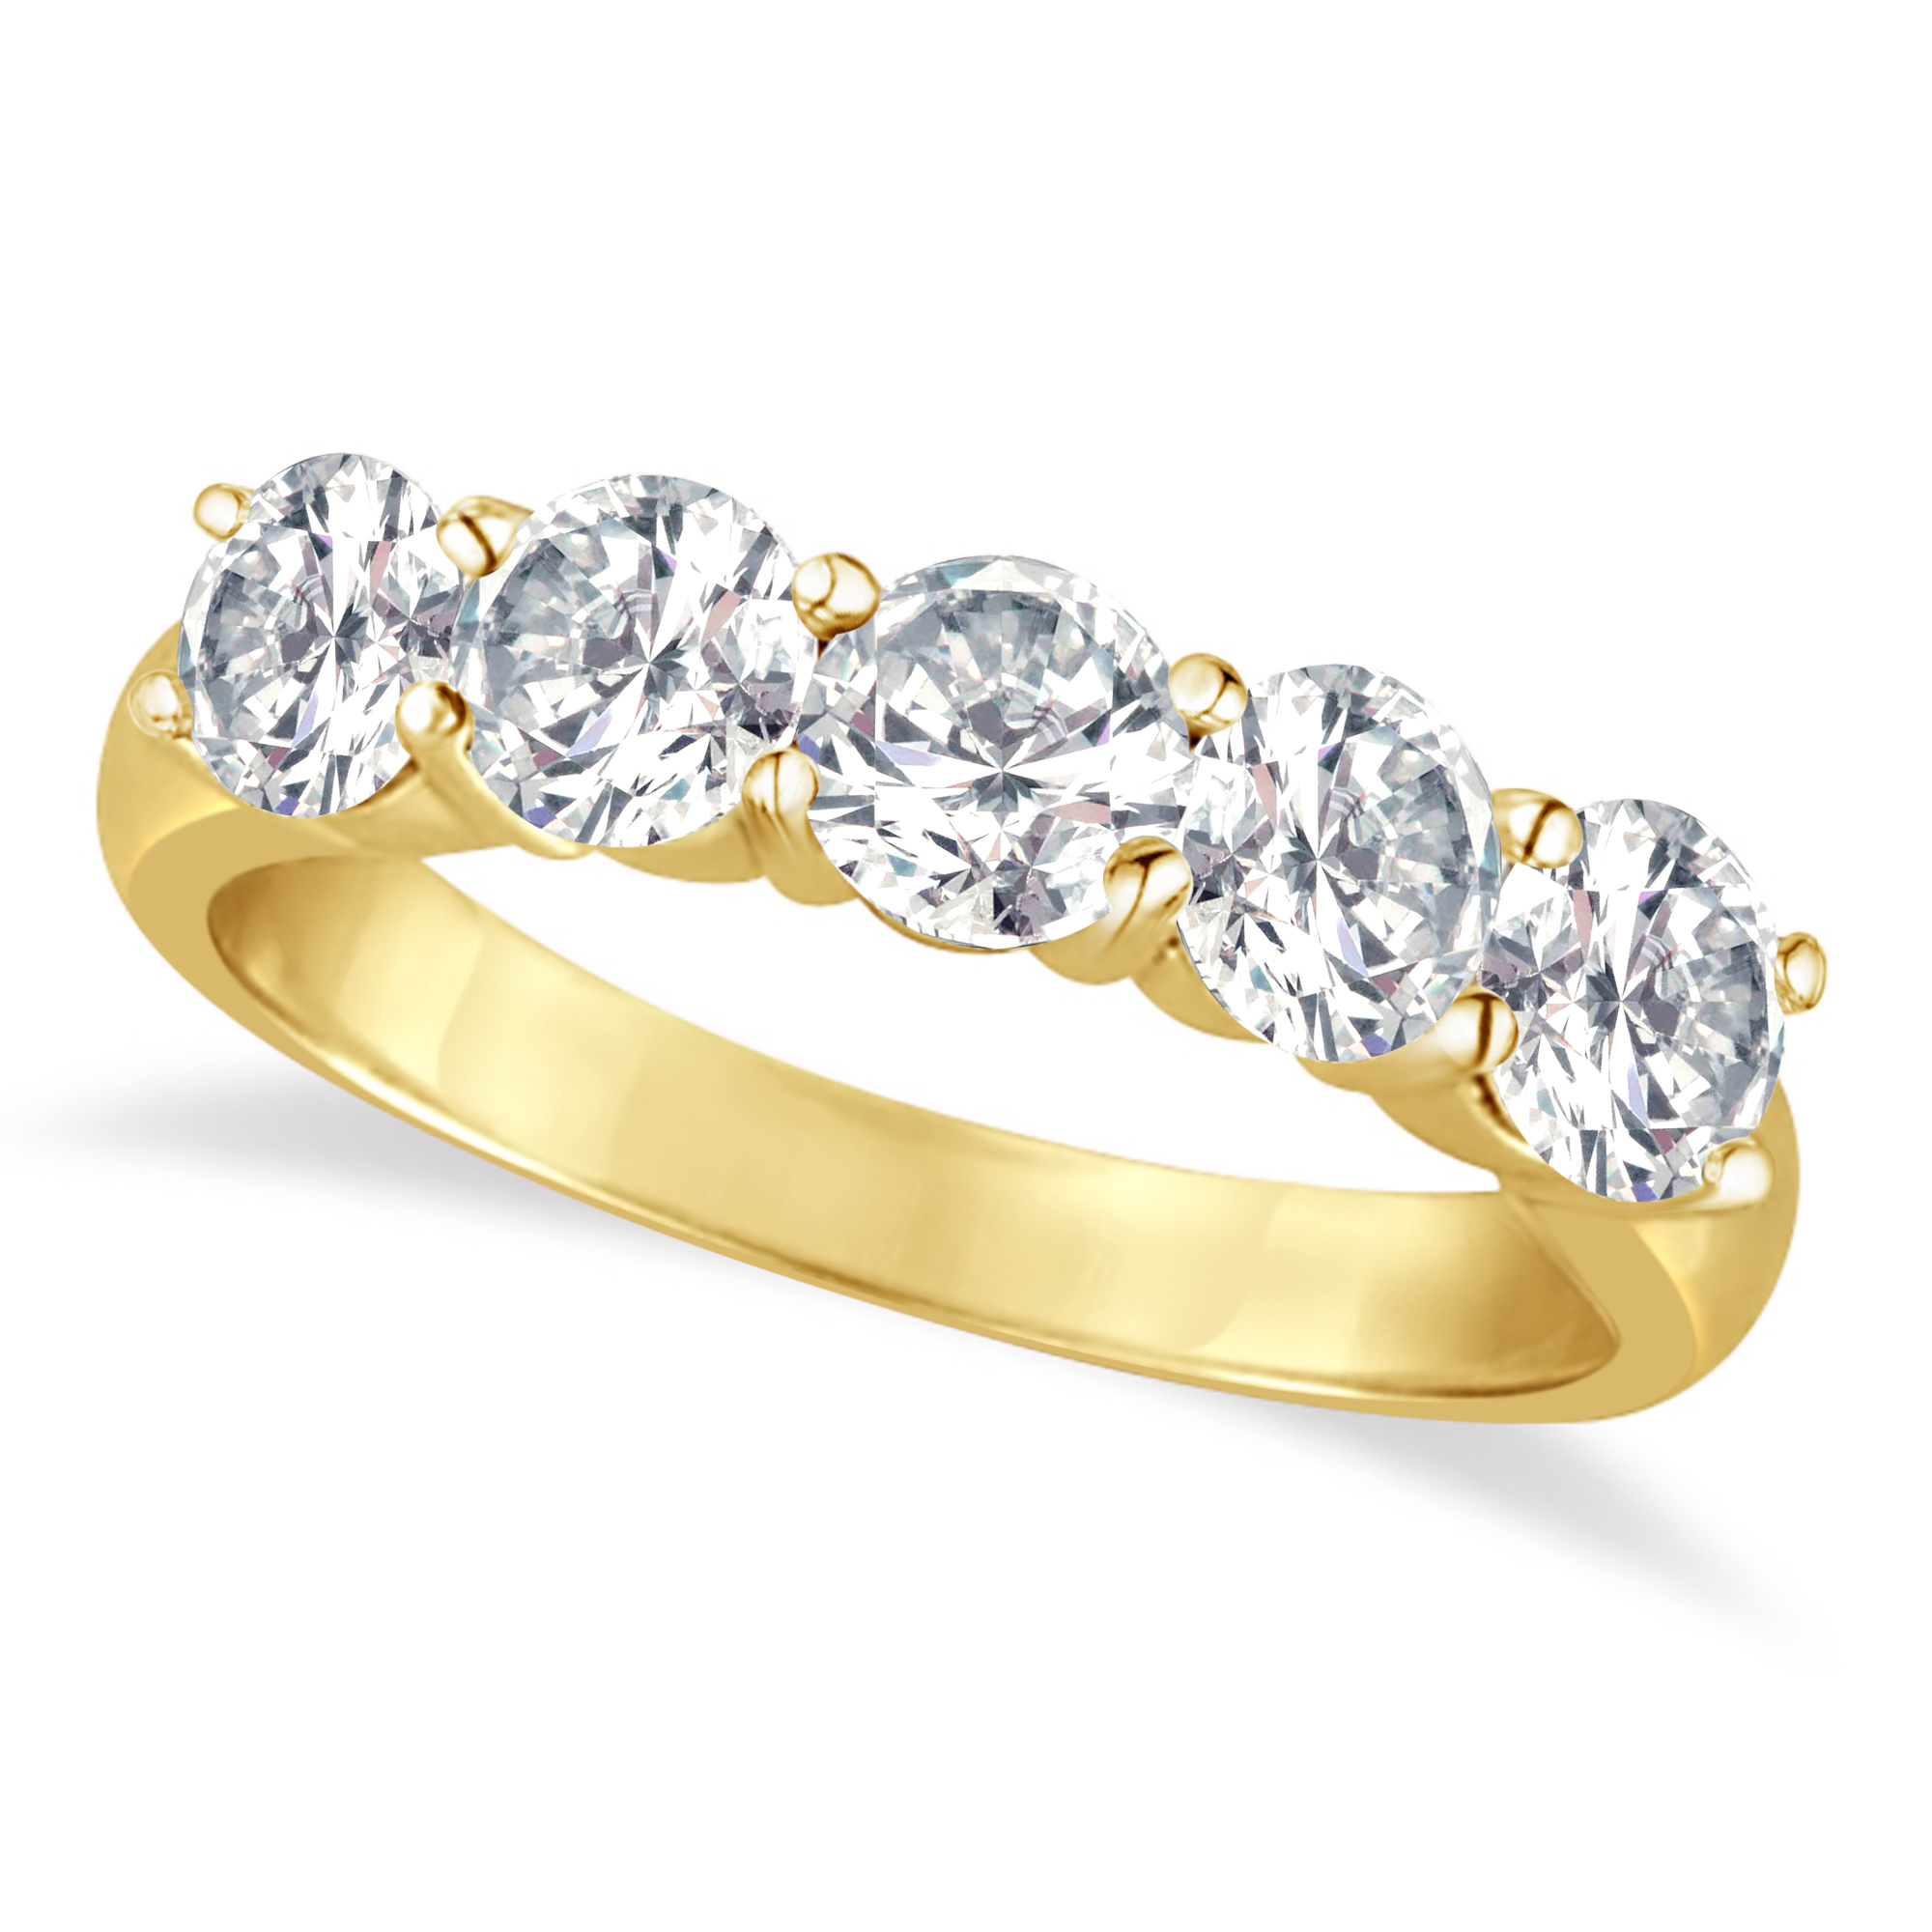 five stone diamond ring anniversary band 14k yellow gold. Black Bedroom Furniture Sets. Home Design Ideas